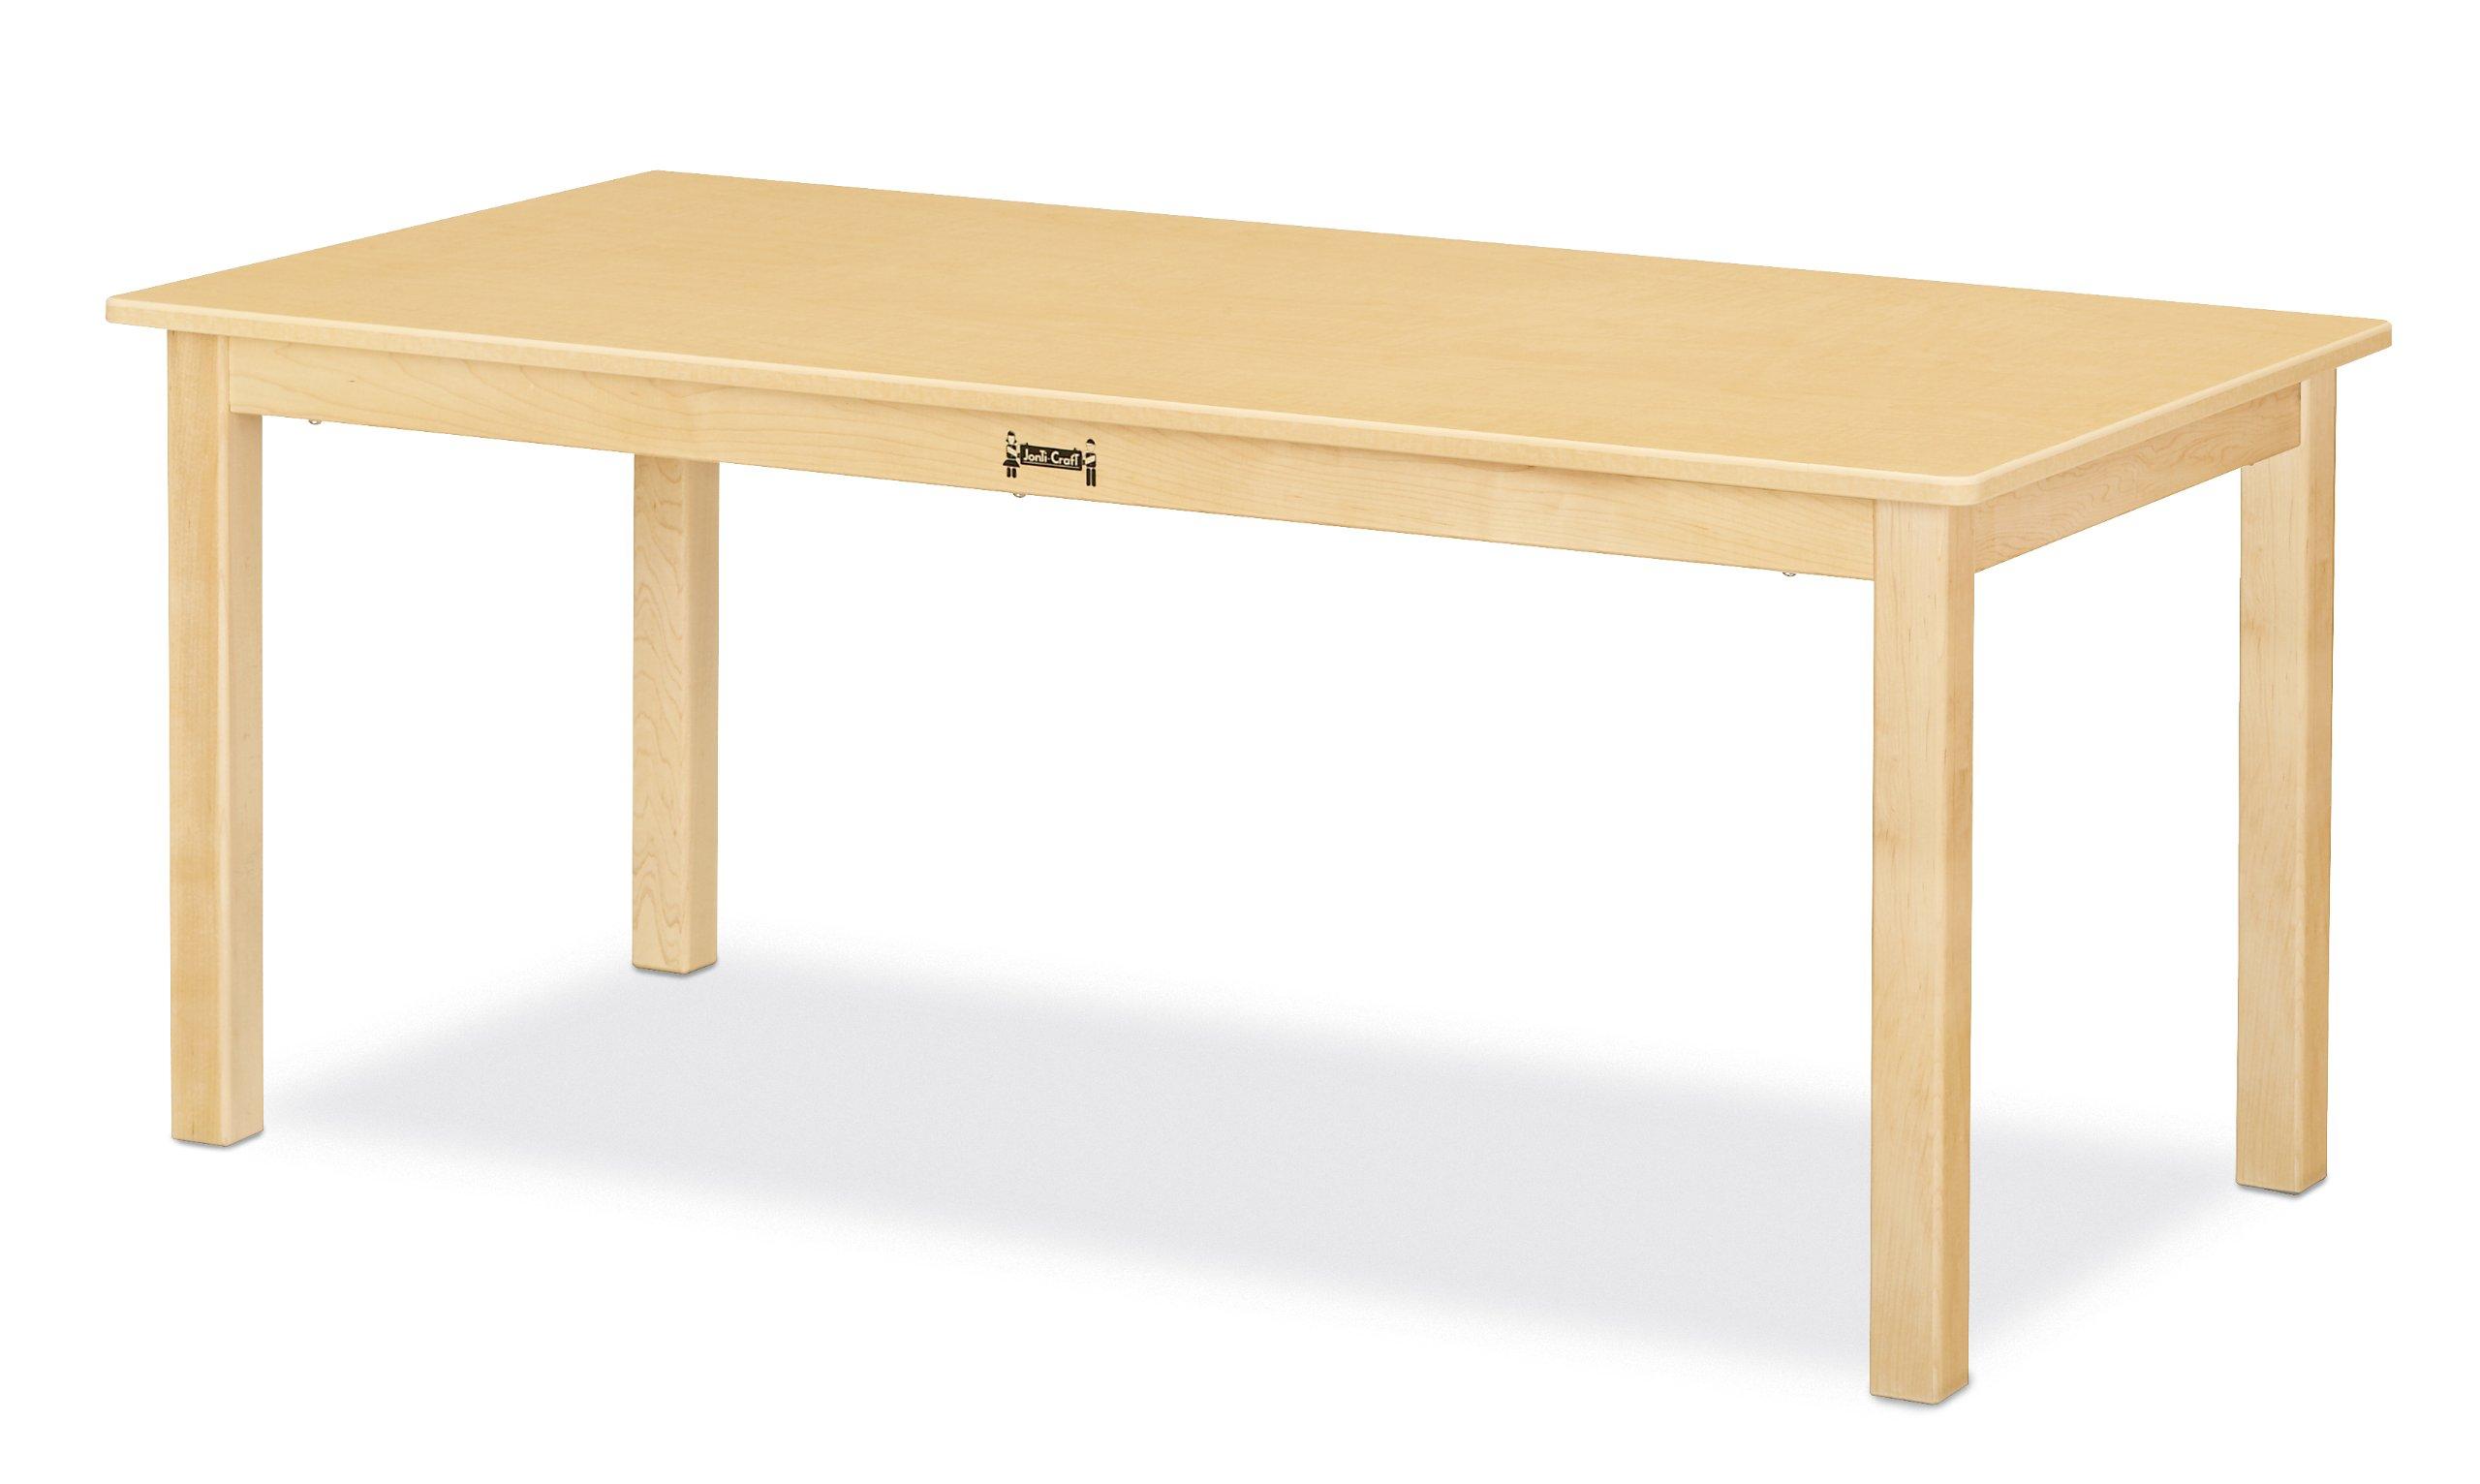 Jonti-Craft 56824JC Multi-Purpose Large Rectangle Table, 24'' High, Maple